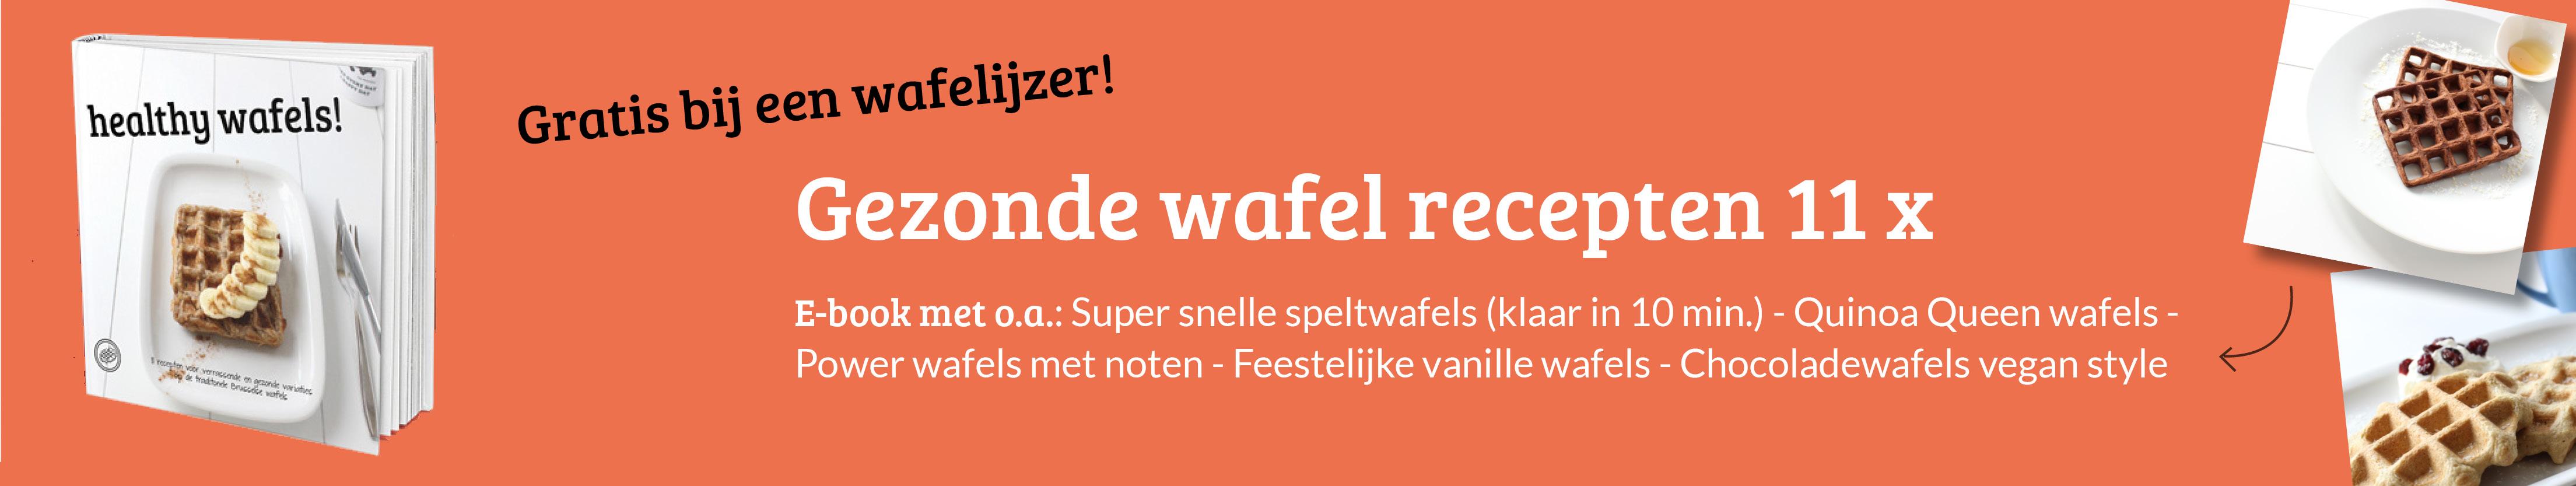 gezonde-wafels-cadeautje-wafelijzer